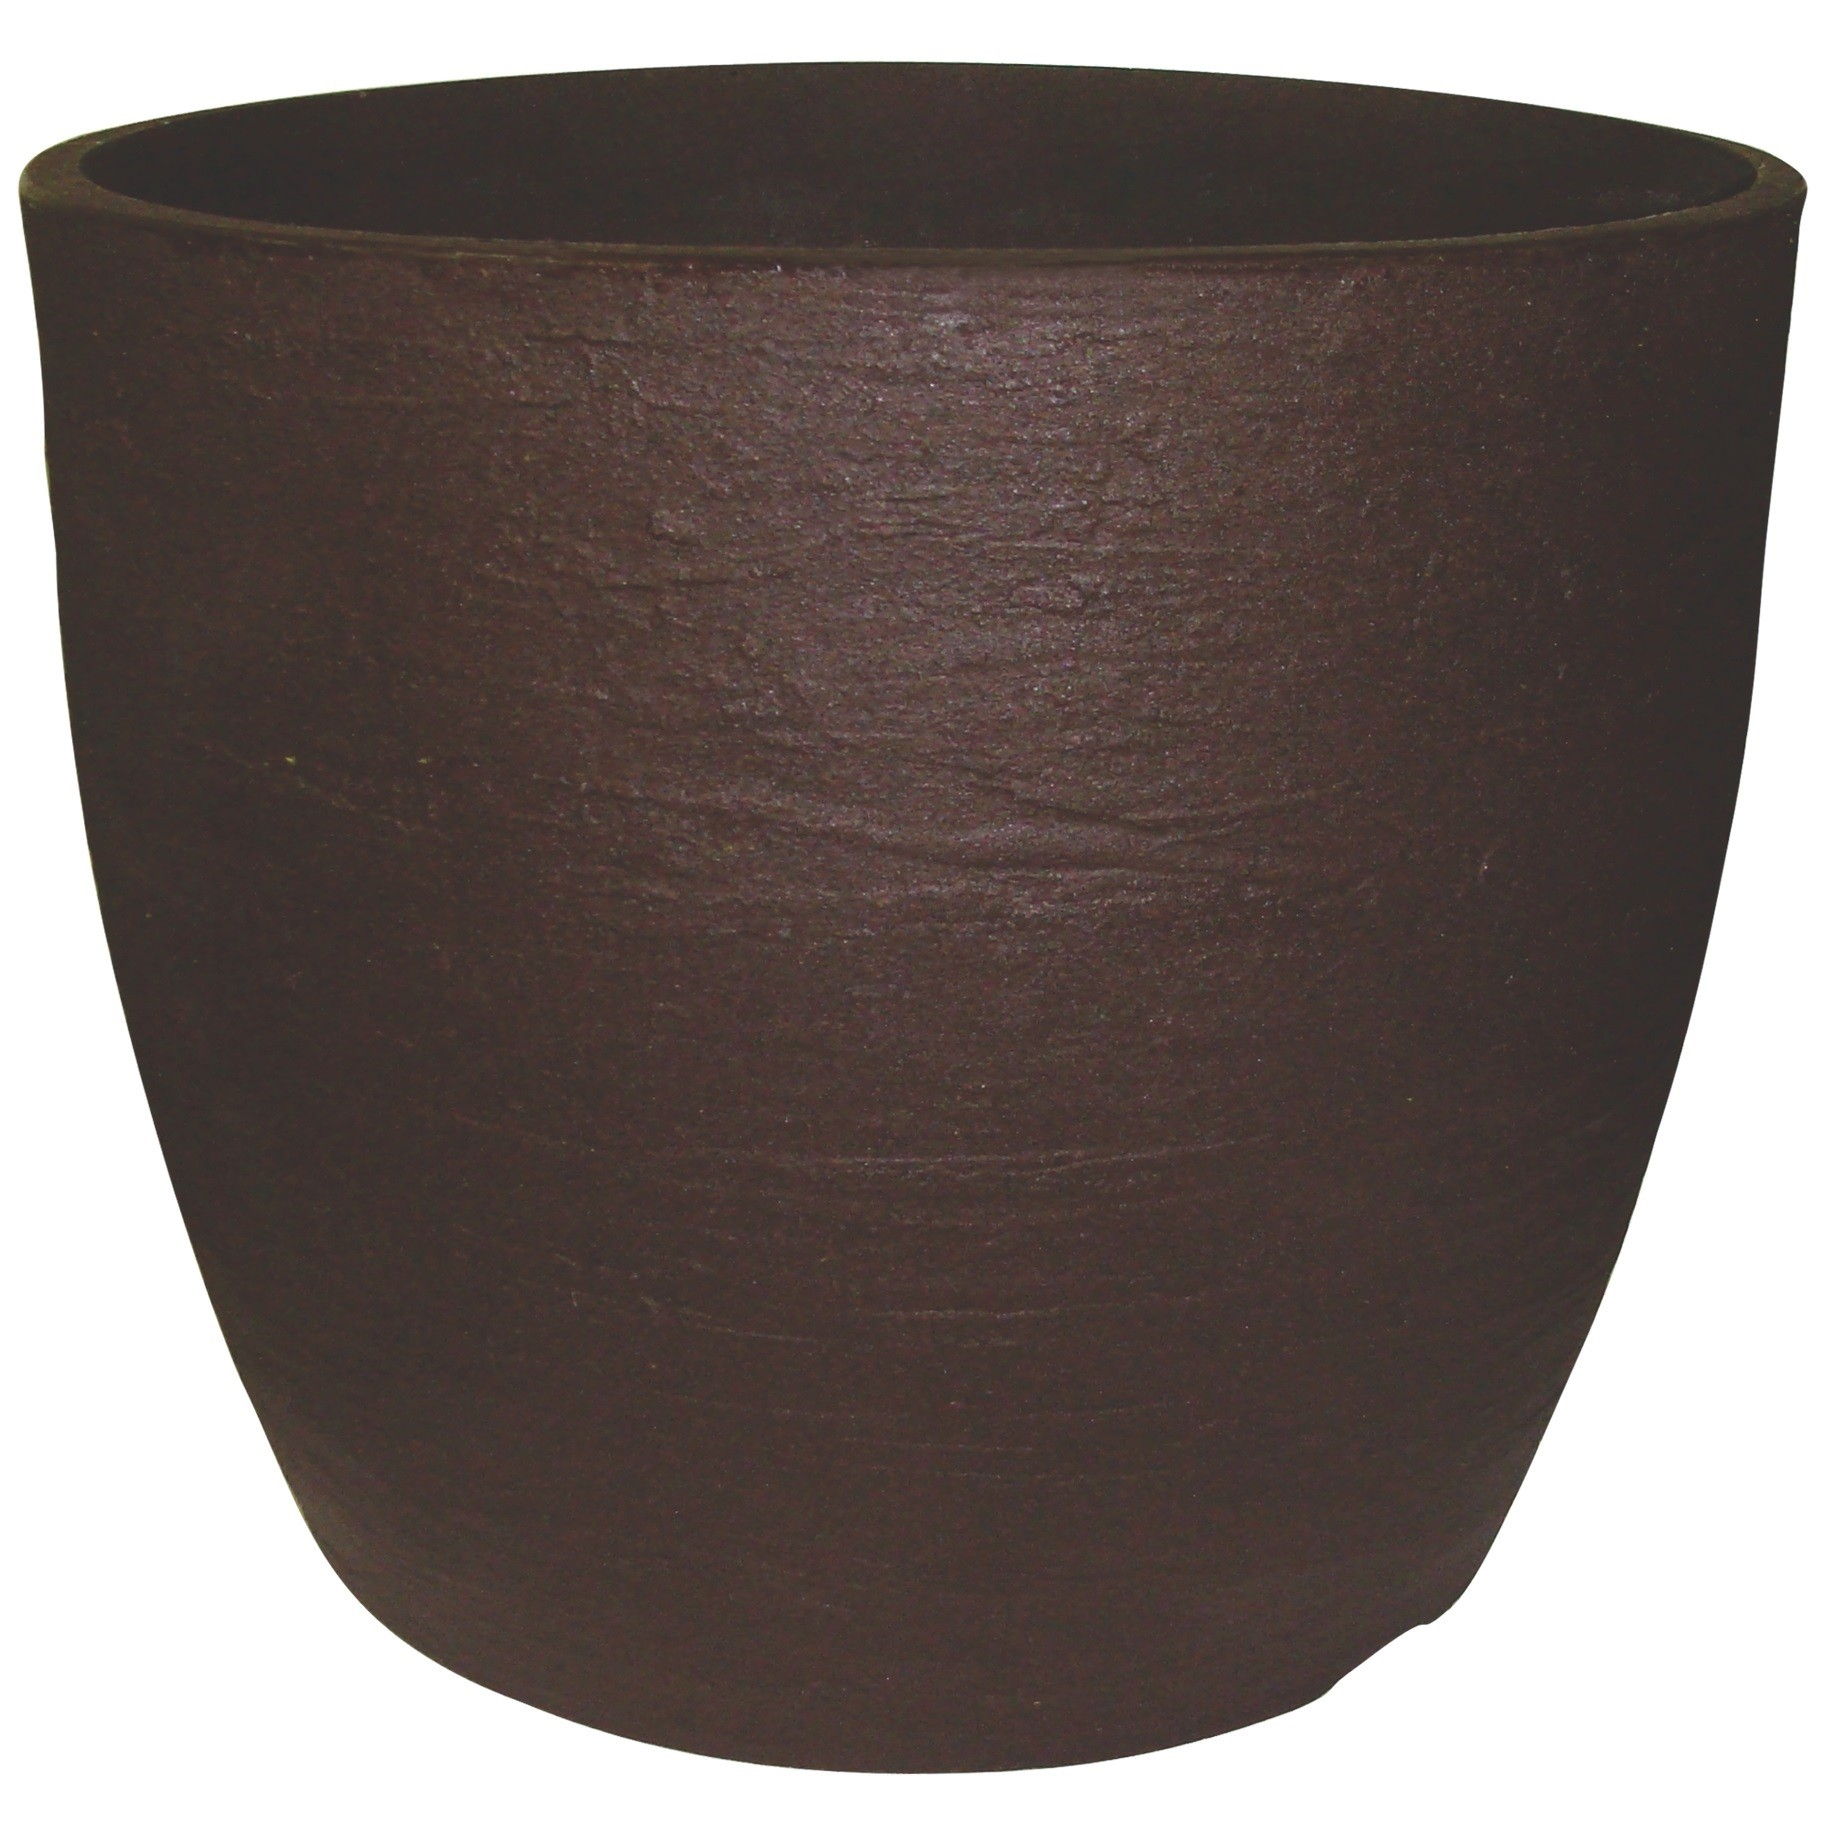 Vaso para Plantas Polietileno 28x33 cm Europa Cafe - Japi